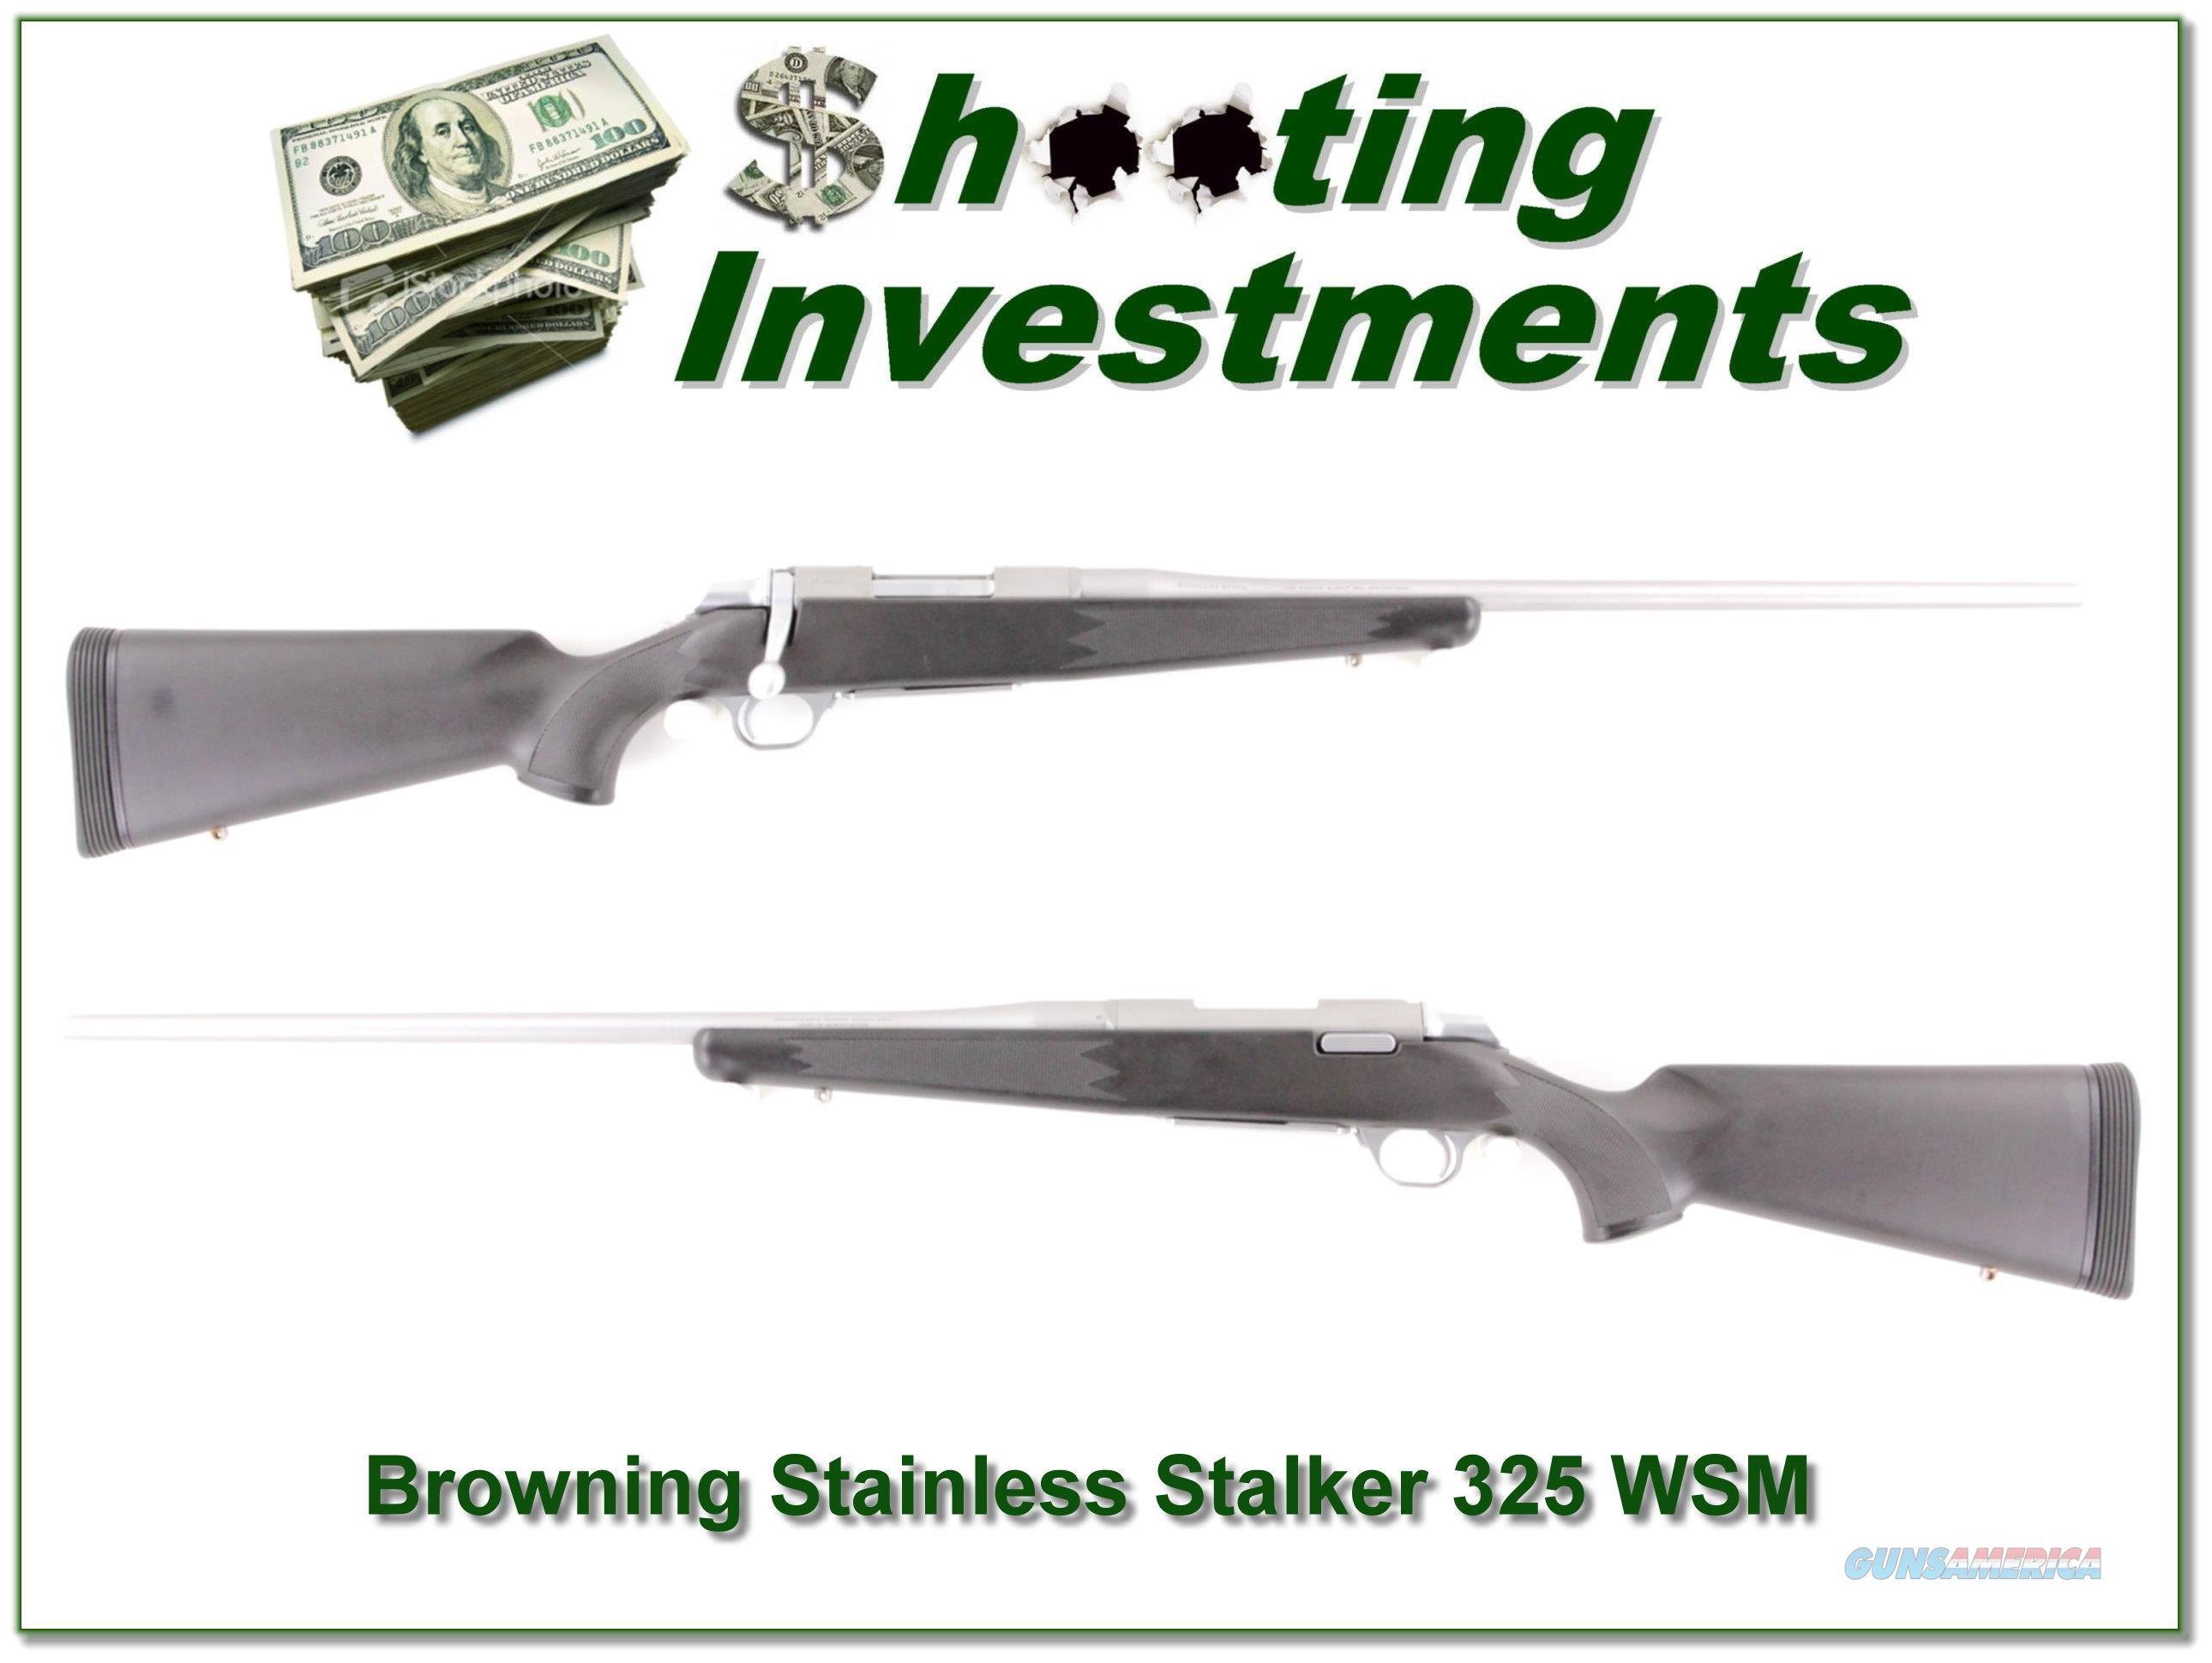 Browning A-bolt Stainless Stalker 325 WSM  Guns > Rifles > Browning Rifles > Bolt Action > Hunting > Stainless